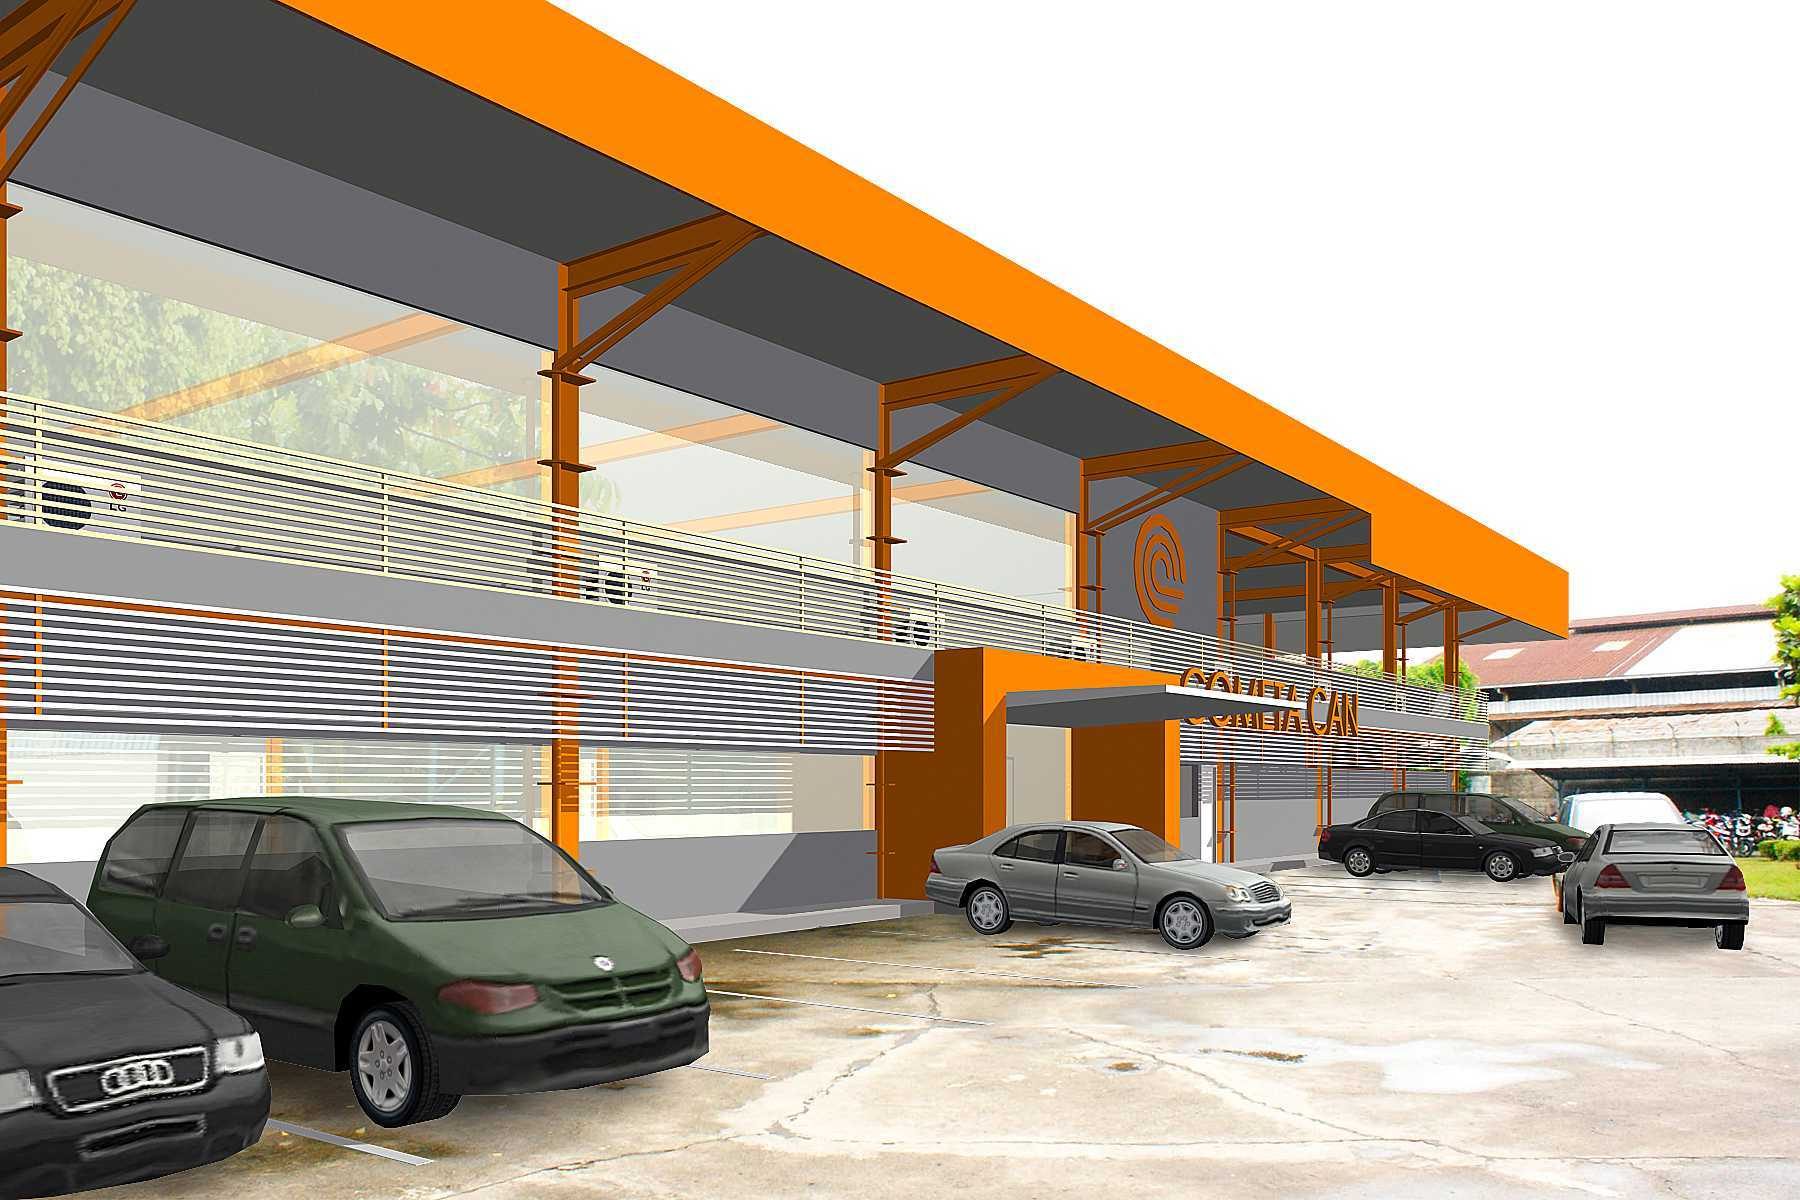 Pt.  Atelier Una Indonesia Cometa Office  Bitung, Kota Bitung, Sulawesi Utara, Indonesia Bitung, Kota Bitung, Sulawesi Utara, Indonesia Pt-Atelier-Una-Indonesia-Cometa-Office-  57929